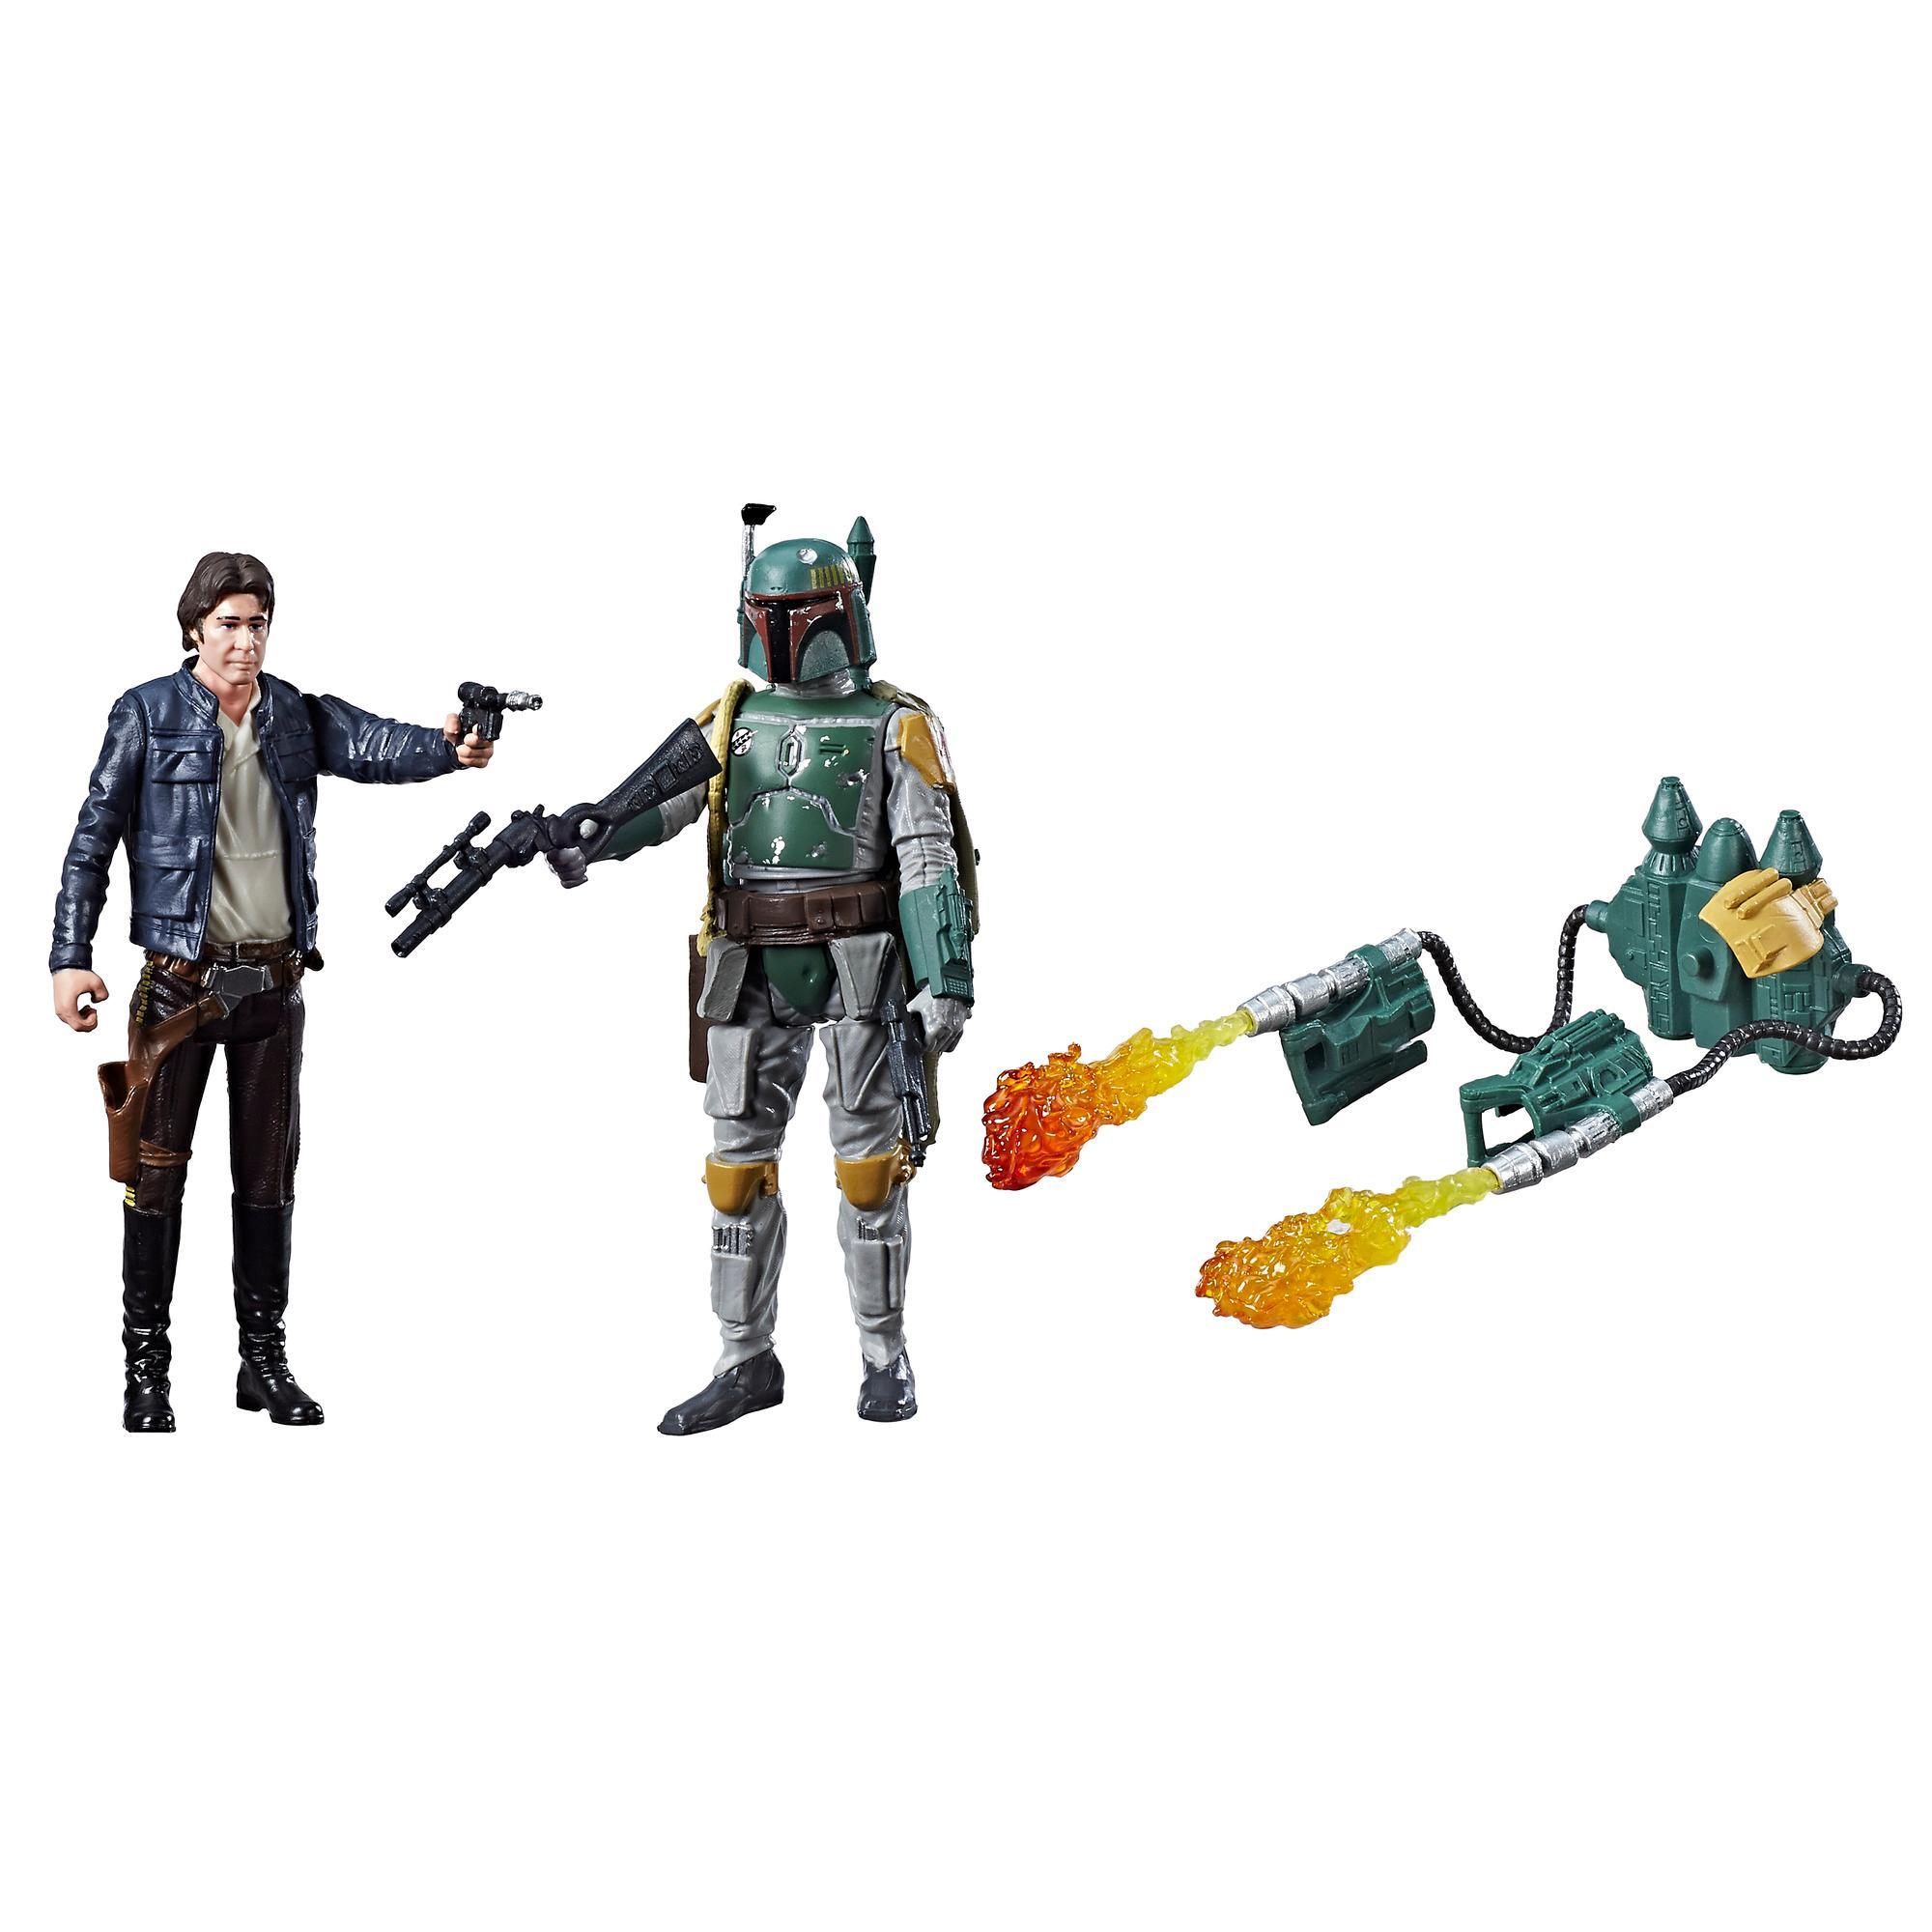 Kit Star Wars Han Solo & Boba Fett